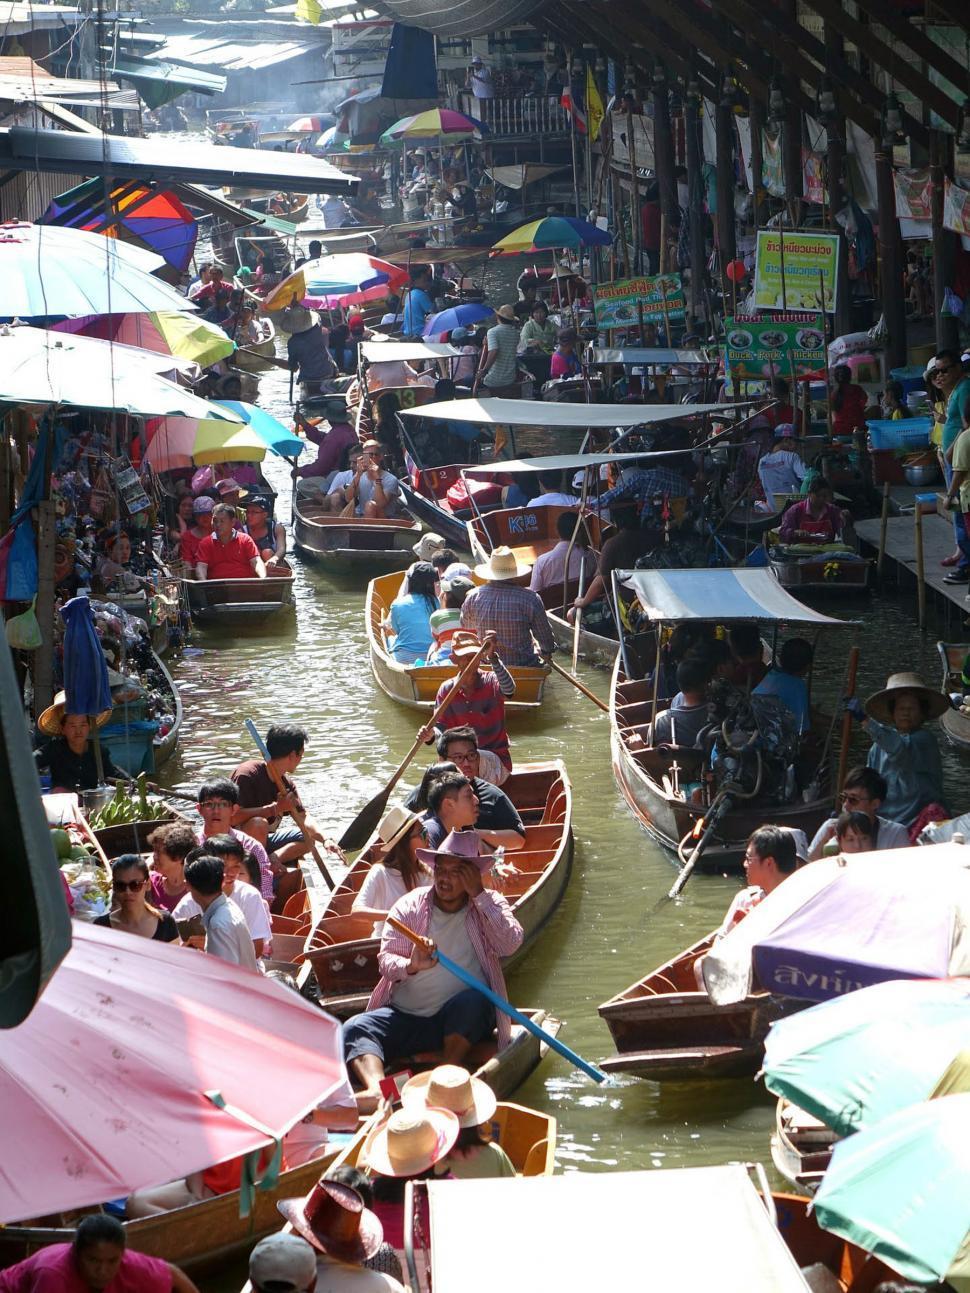 Download Free Stock HD Photo of Bankok, Thailand - Damnoen Saduak Floating Market Online